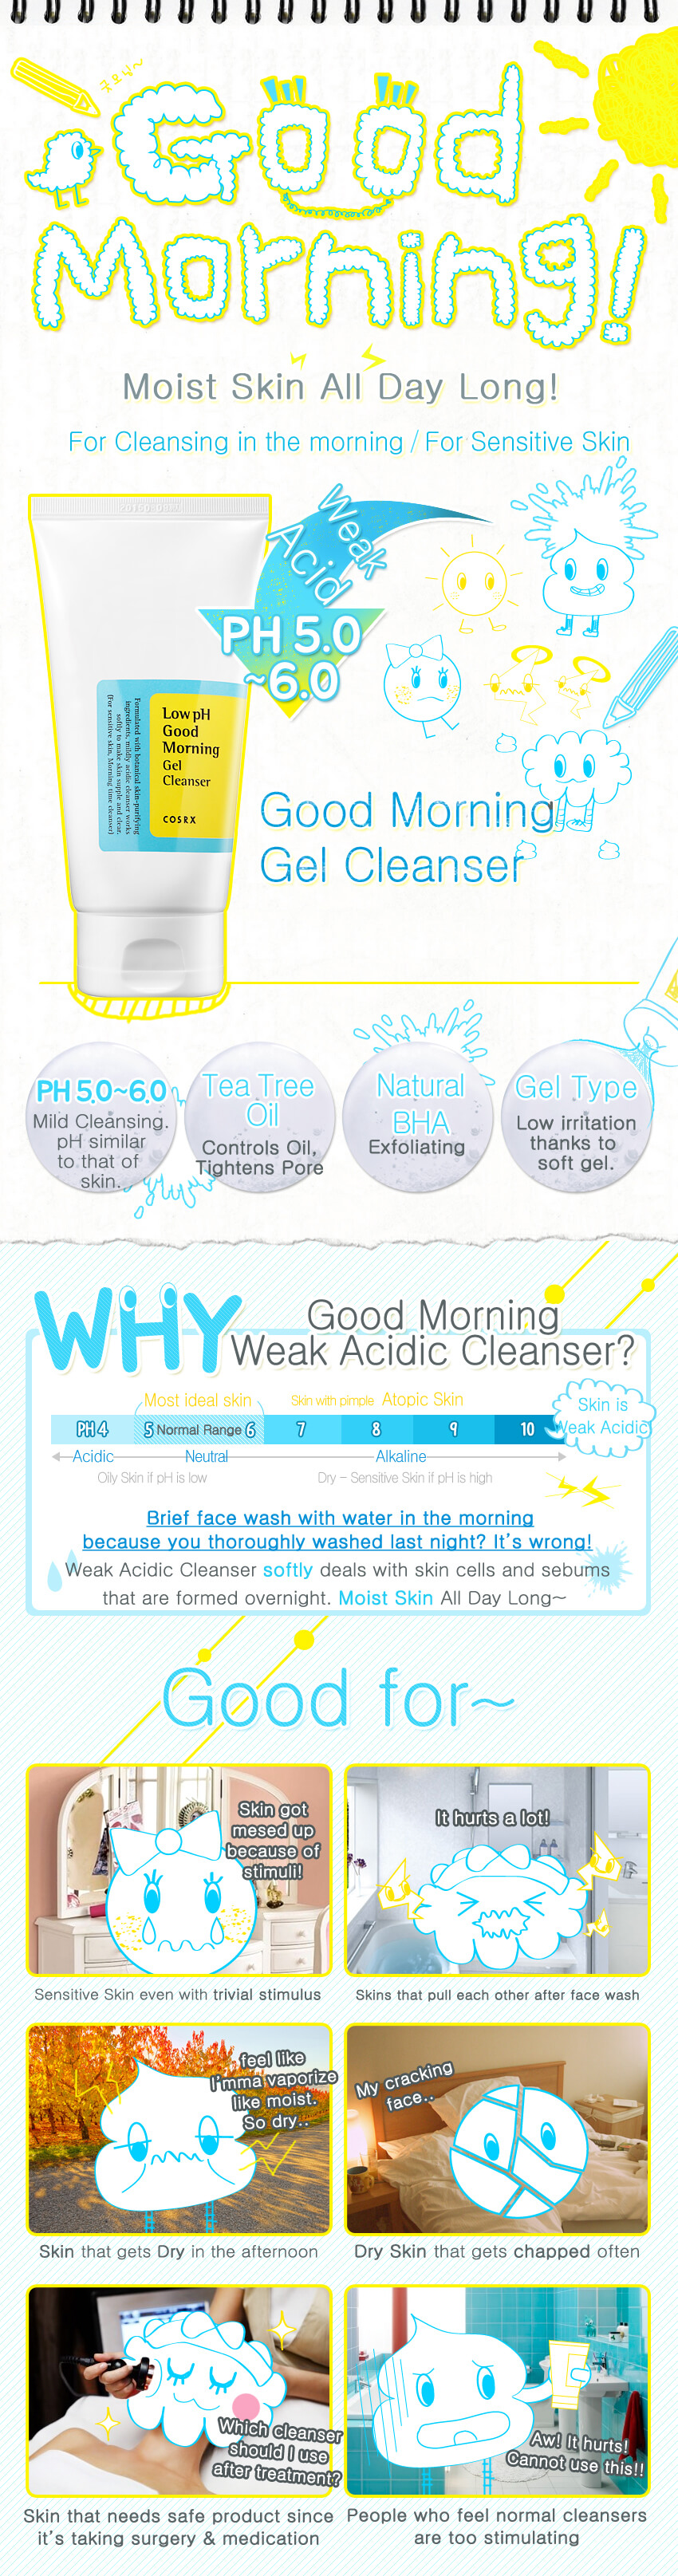 COSRX-low-pH-Good-Morning-Gel-Cleanser-good4